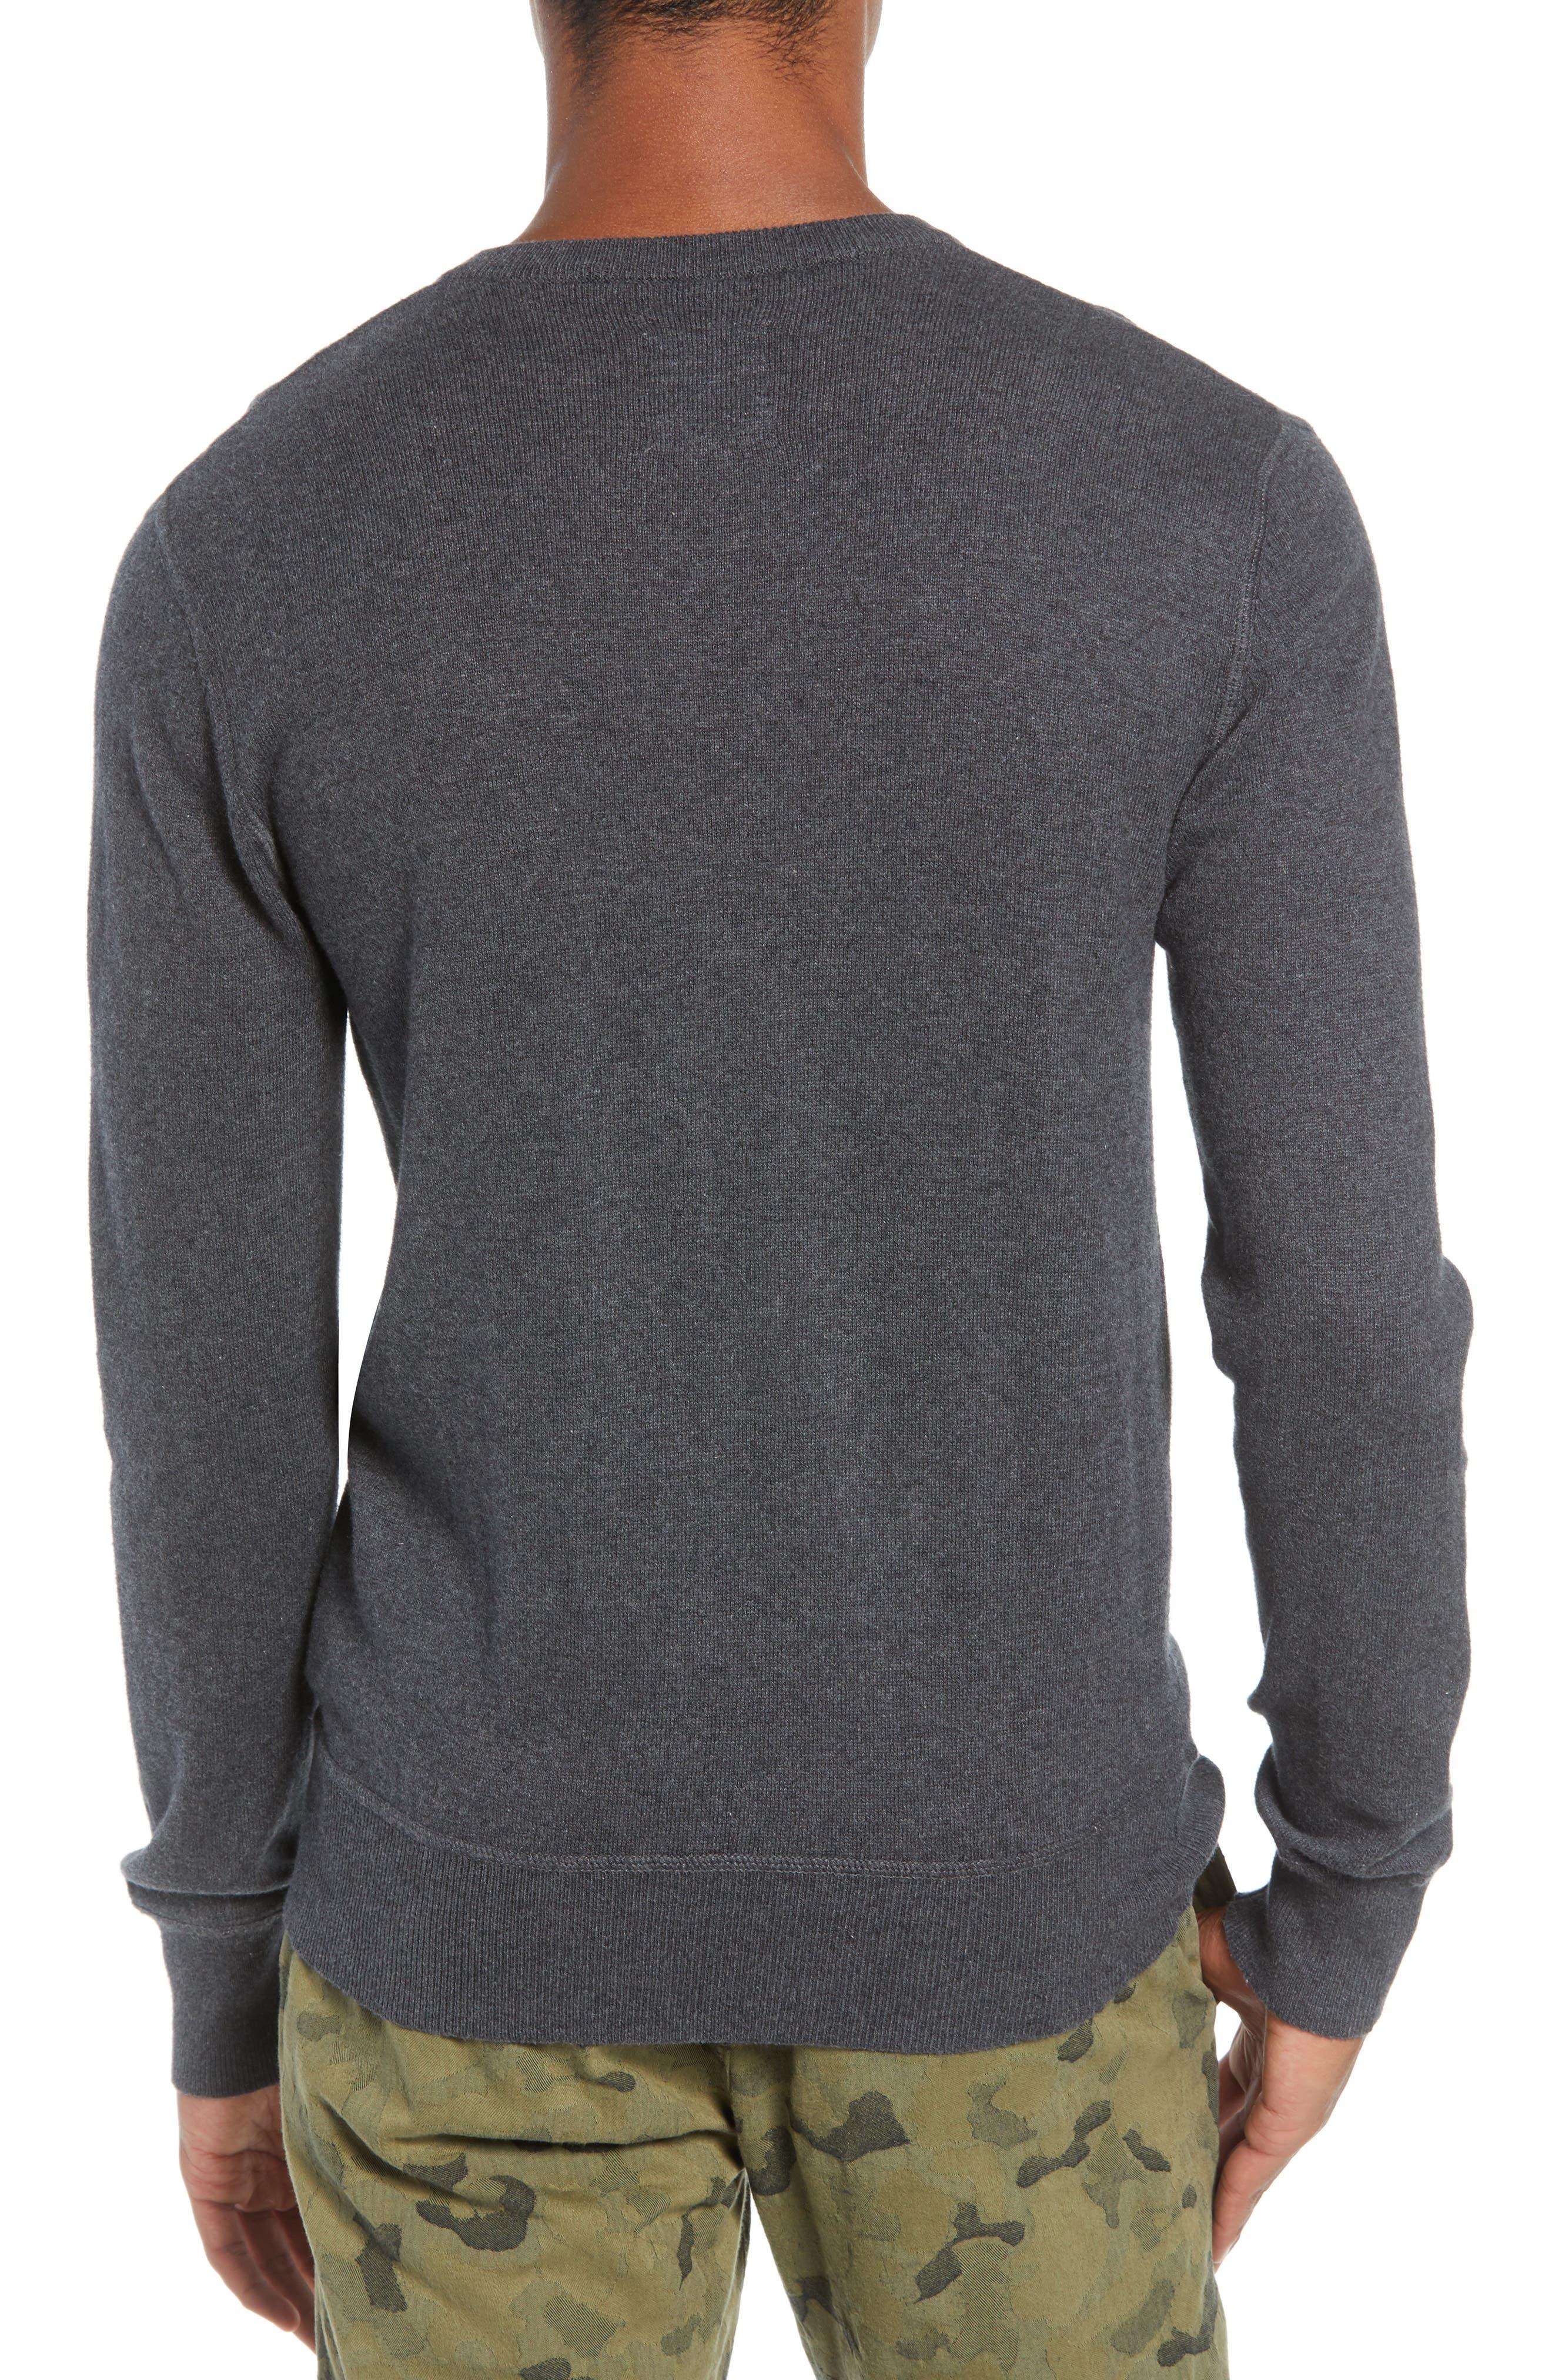 Tournament Slim Fit V-Neck Sweater,                             Alternate thumbnail 2, color,                             HEATHER CHARCOAL